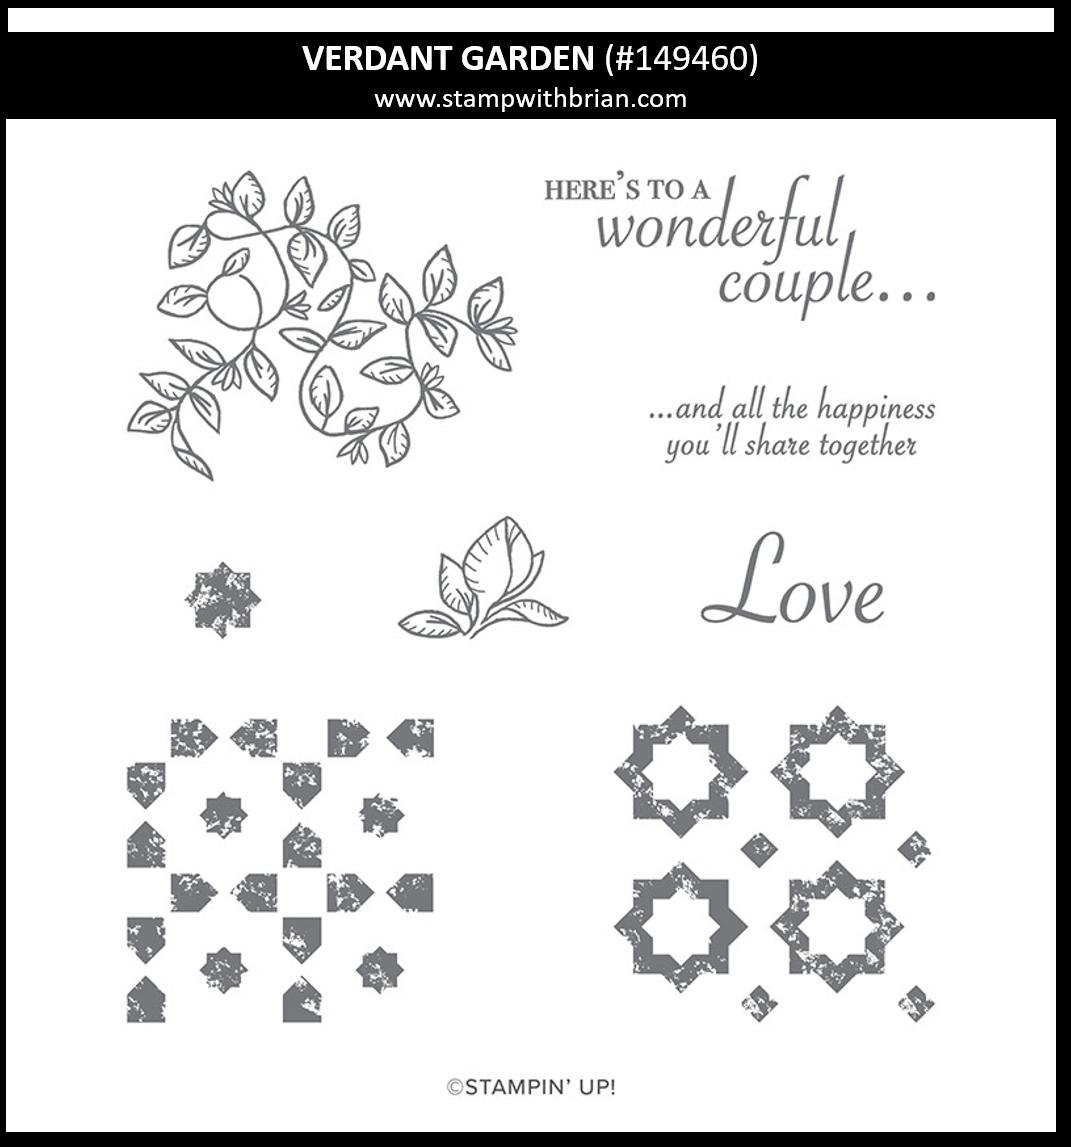 Verdant Garden, Stampin' Up! 149460